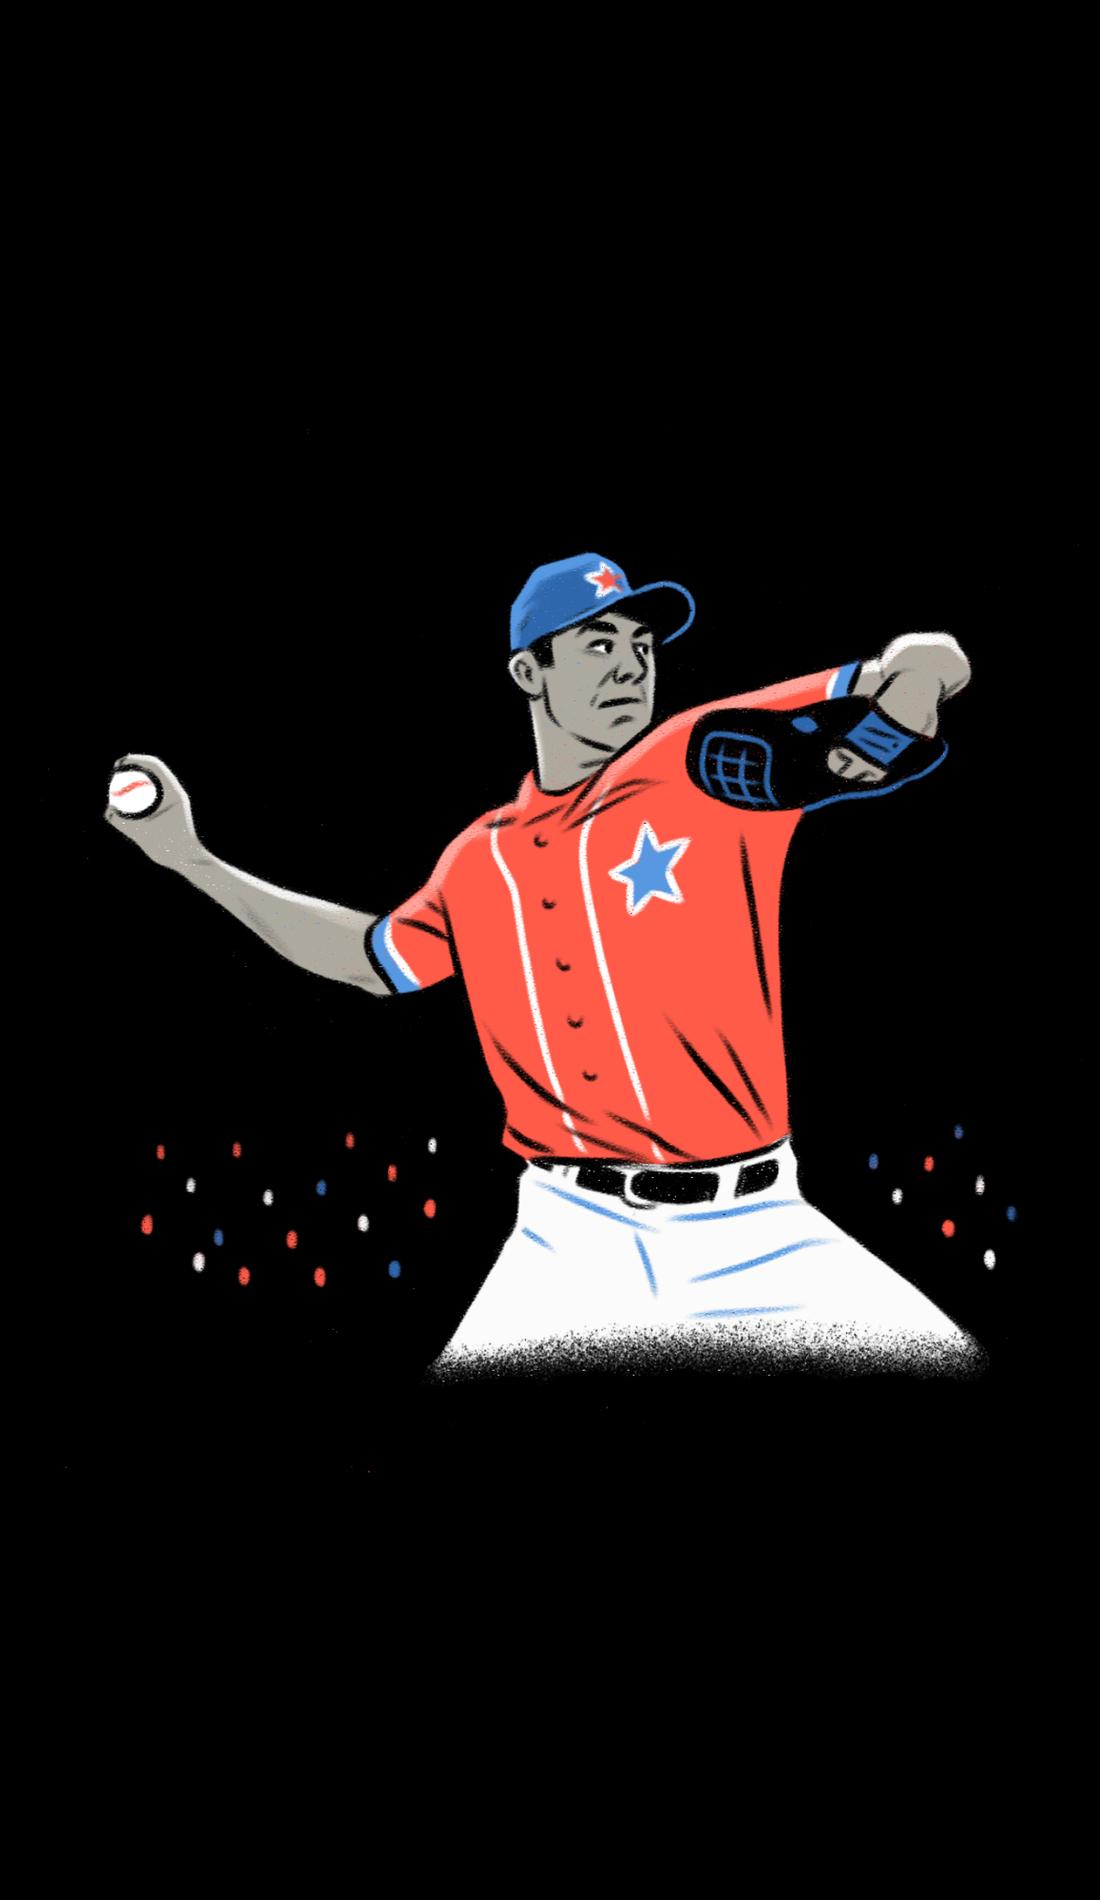 A Baylor Bears Baseball live event